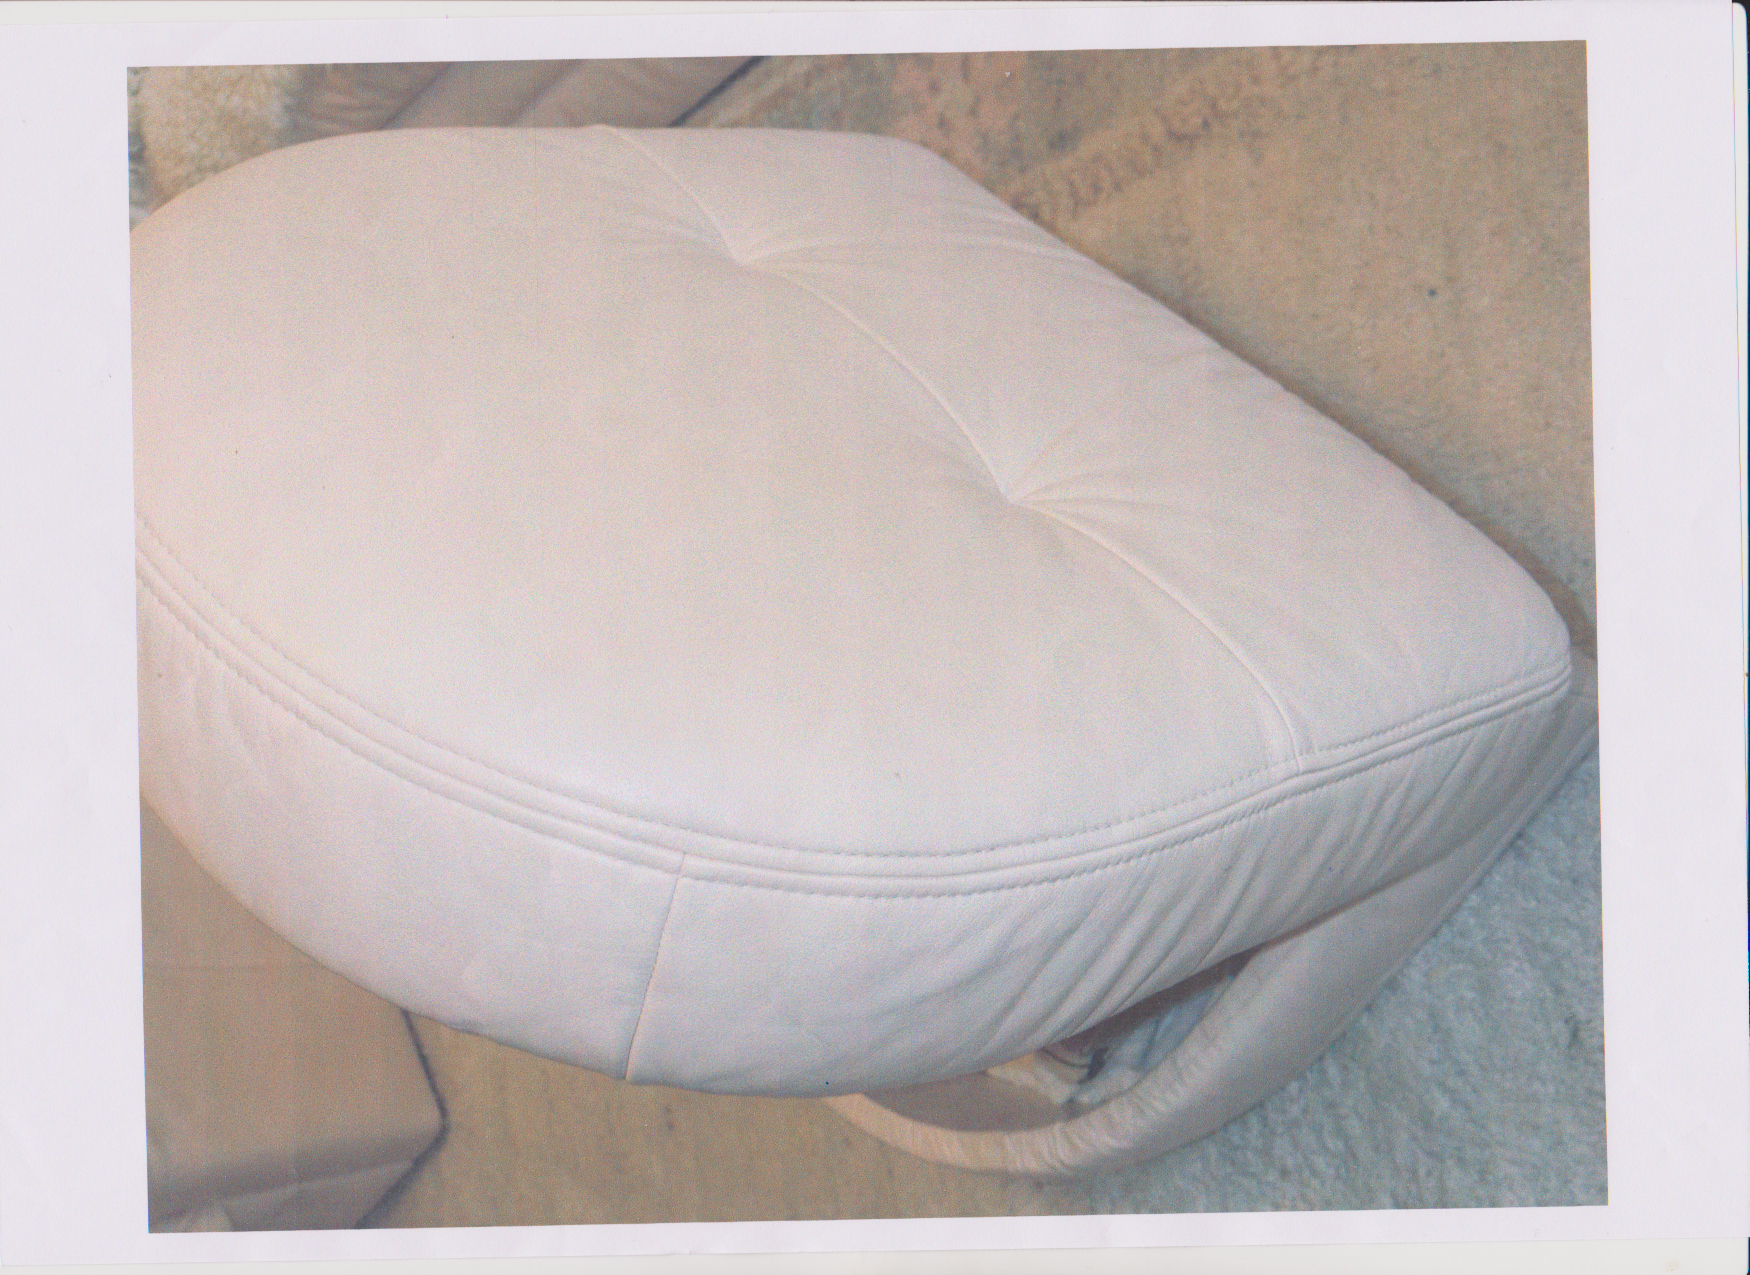 Eckcouch Leder Gebraucht Hukla Eckcouch Garnitur Leder Sitzgruppe Schlaffunktion Sofa Sessel